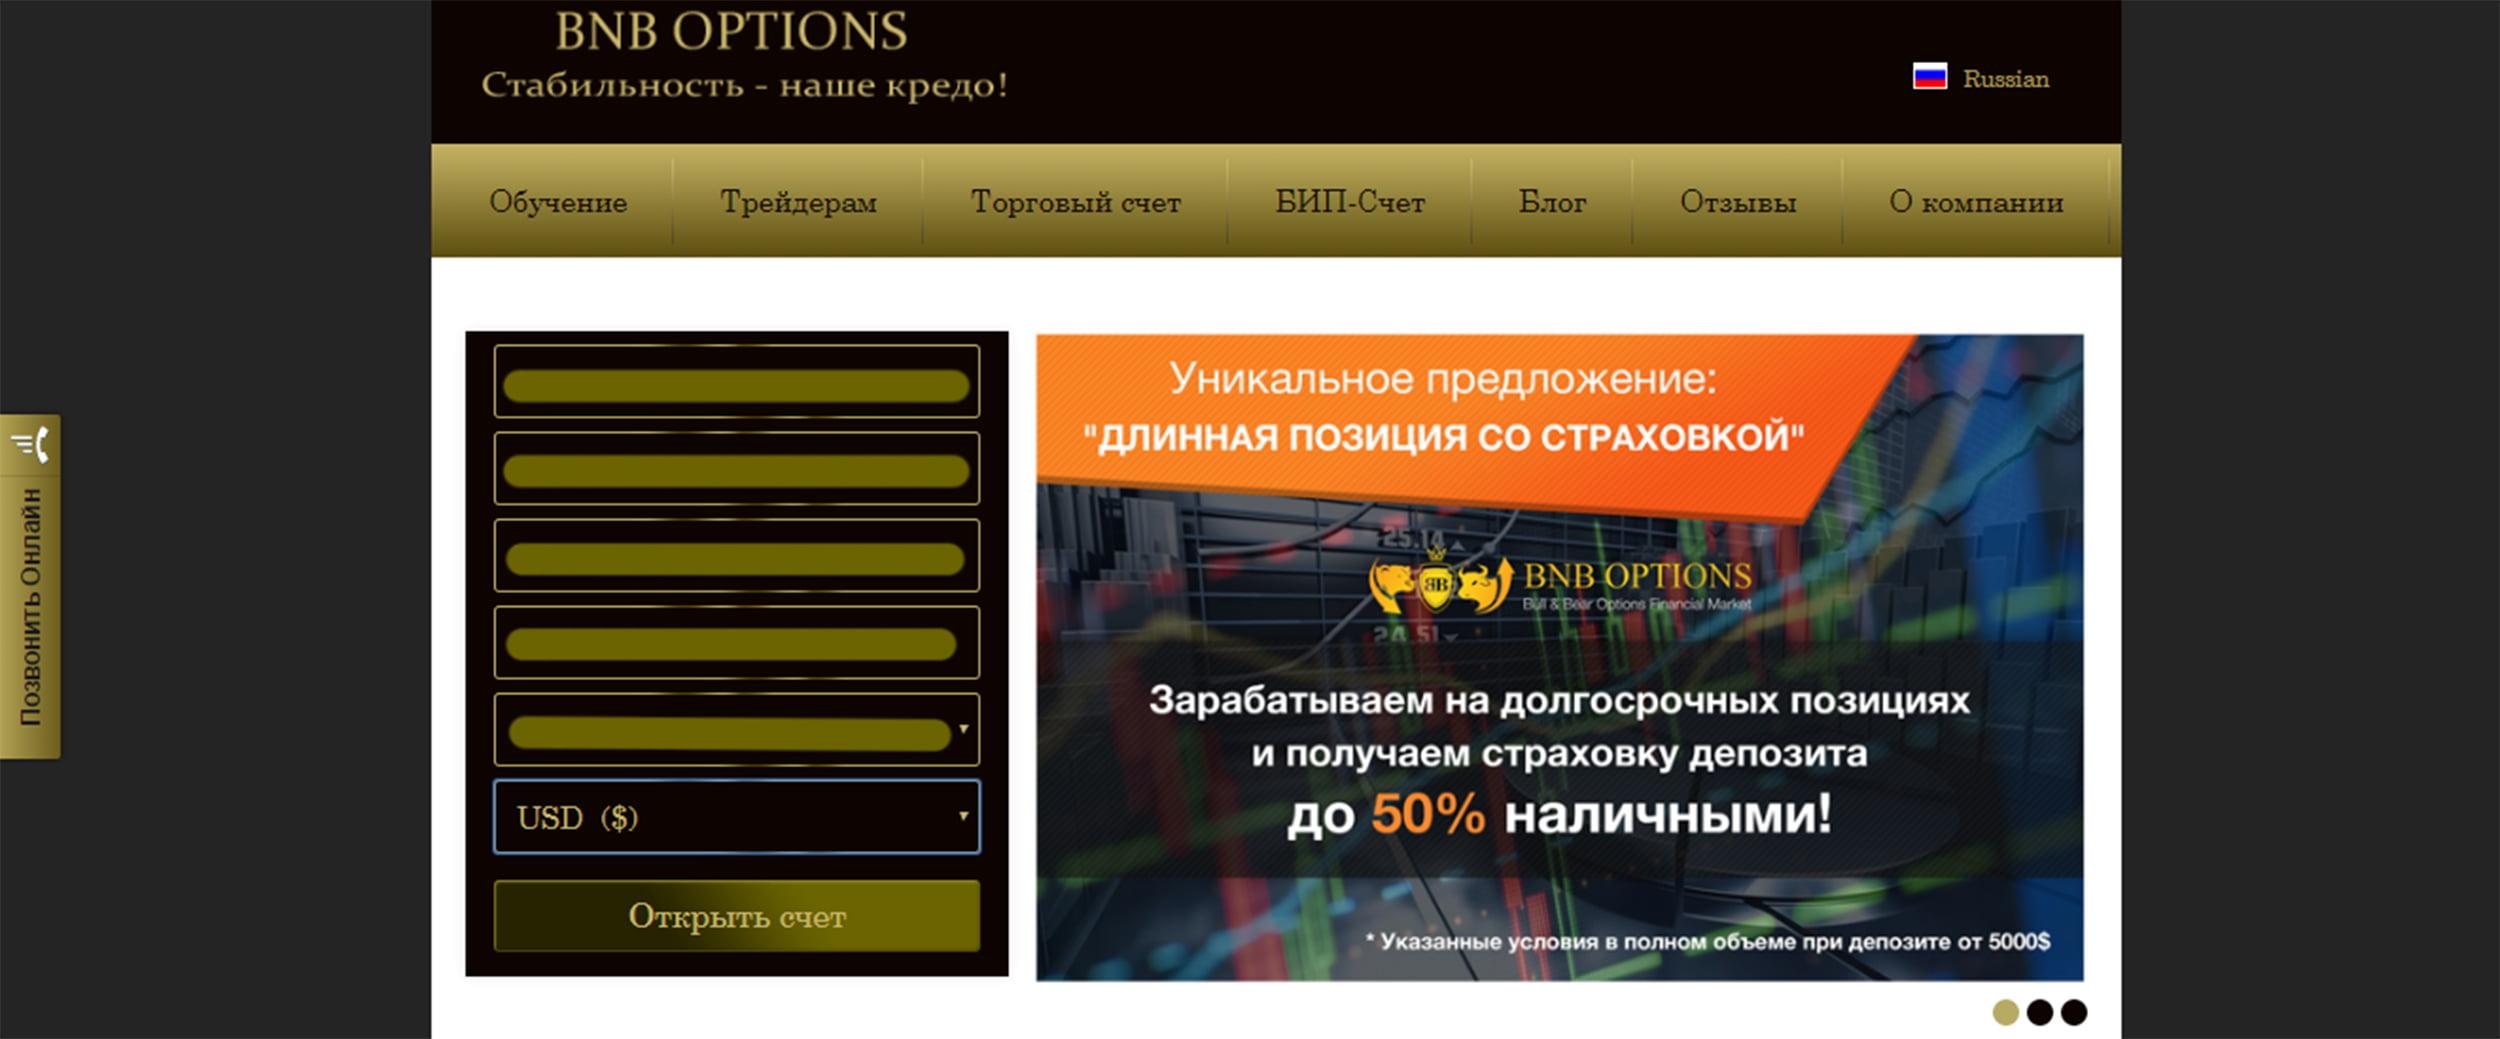 Регистрация в BnB Options